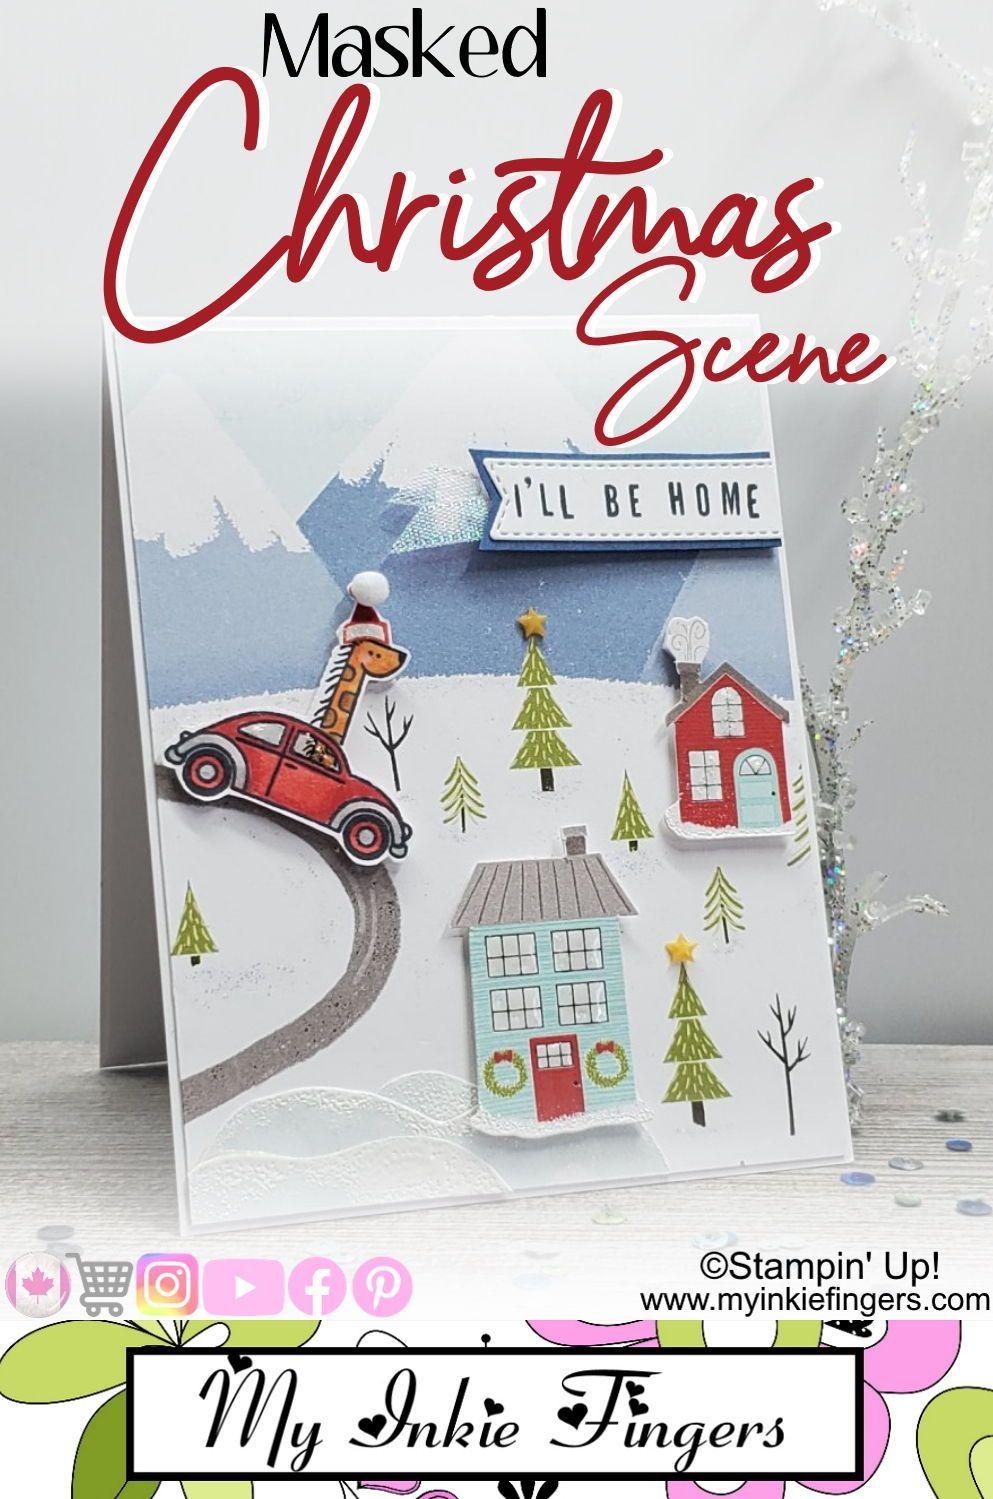 Stampin' Up! Christmas Card 2020 Stampin Up Mini Catalog